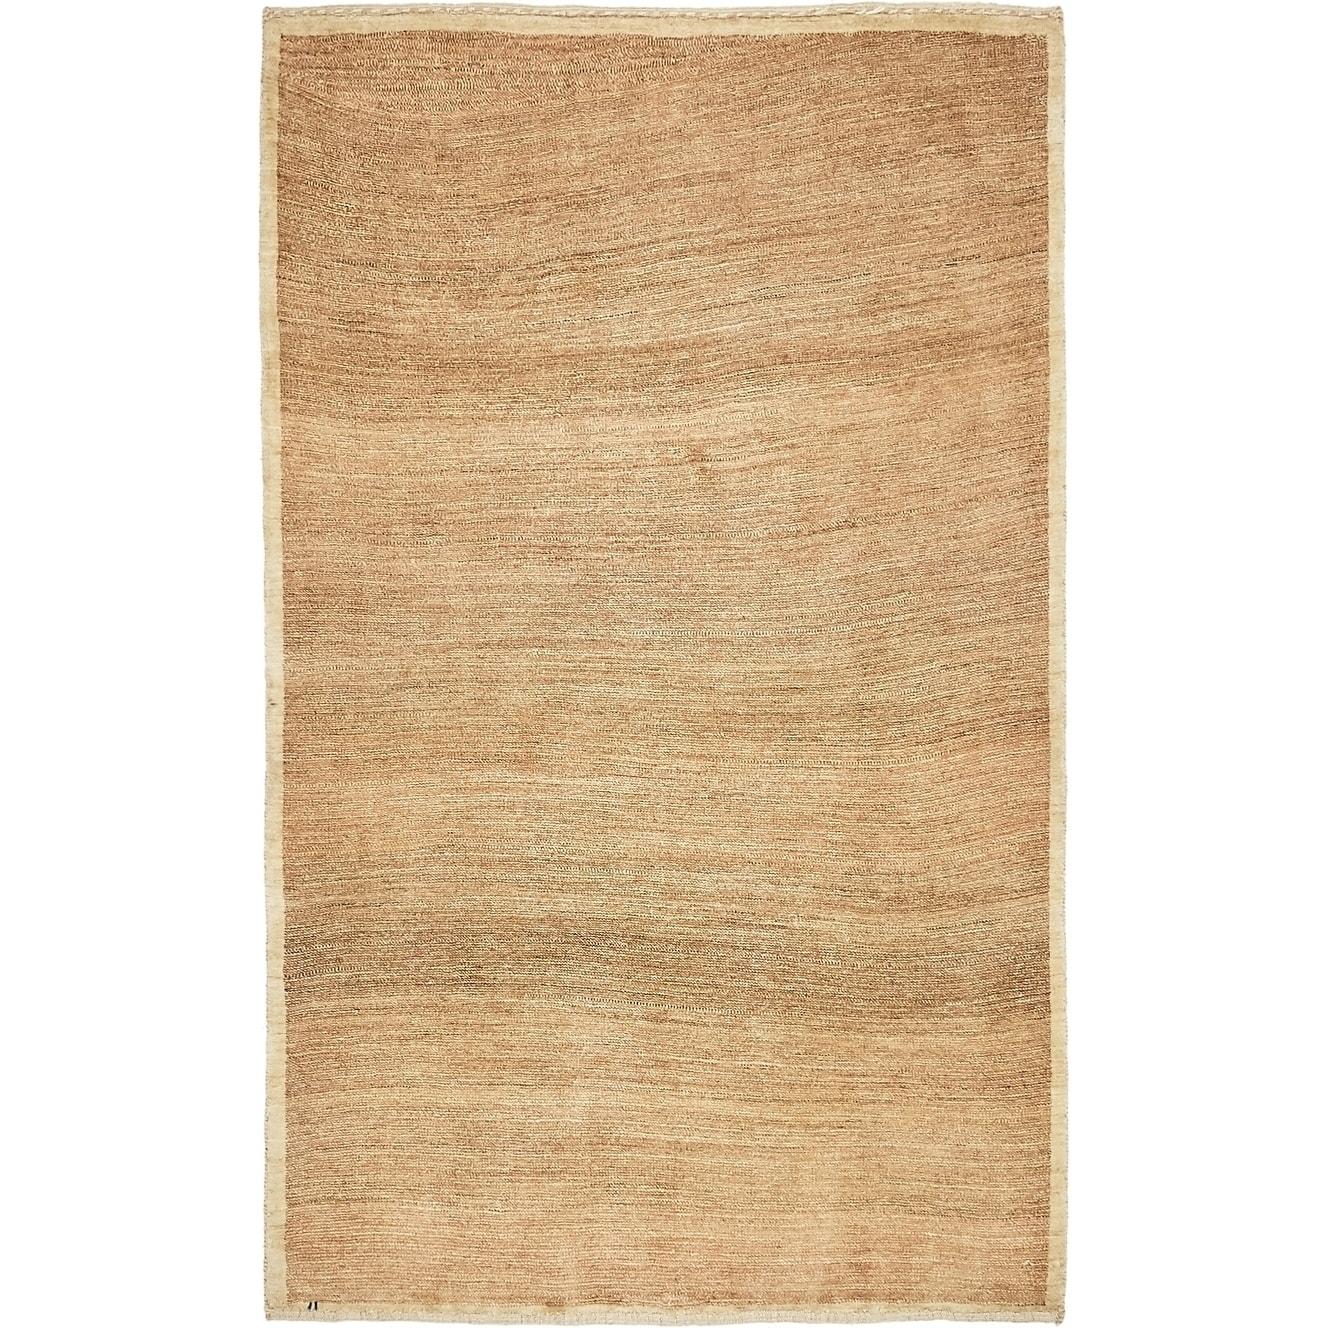 Hand Knotted Kashkuli Gabbeh Wool Area Rug - 3 8 x 6 (Dark Beige - 3 8 x 6)